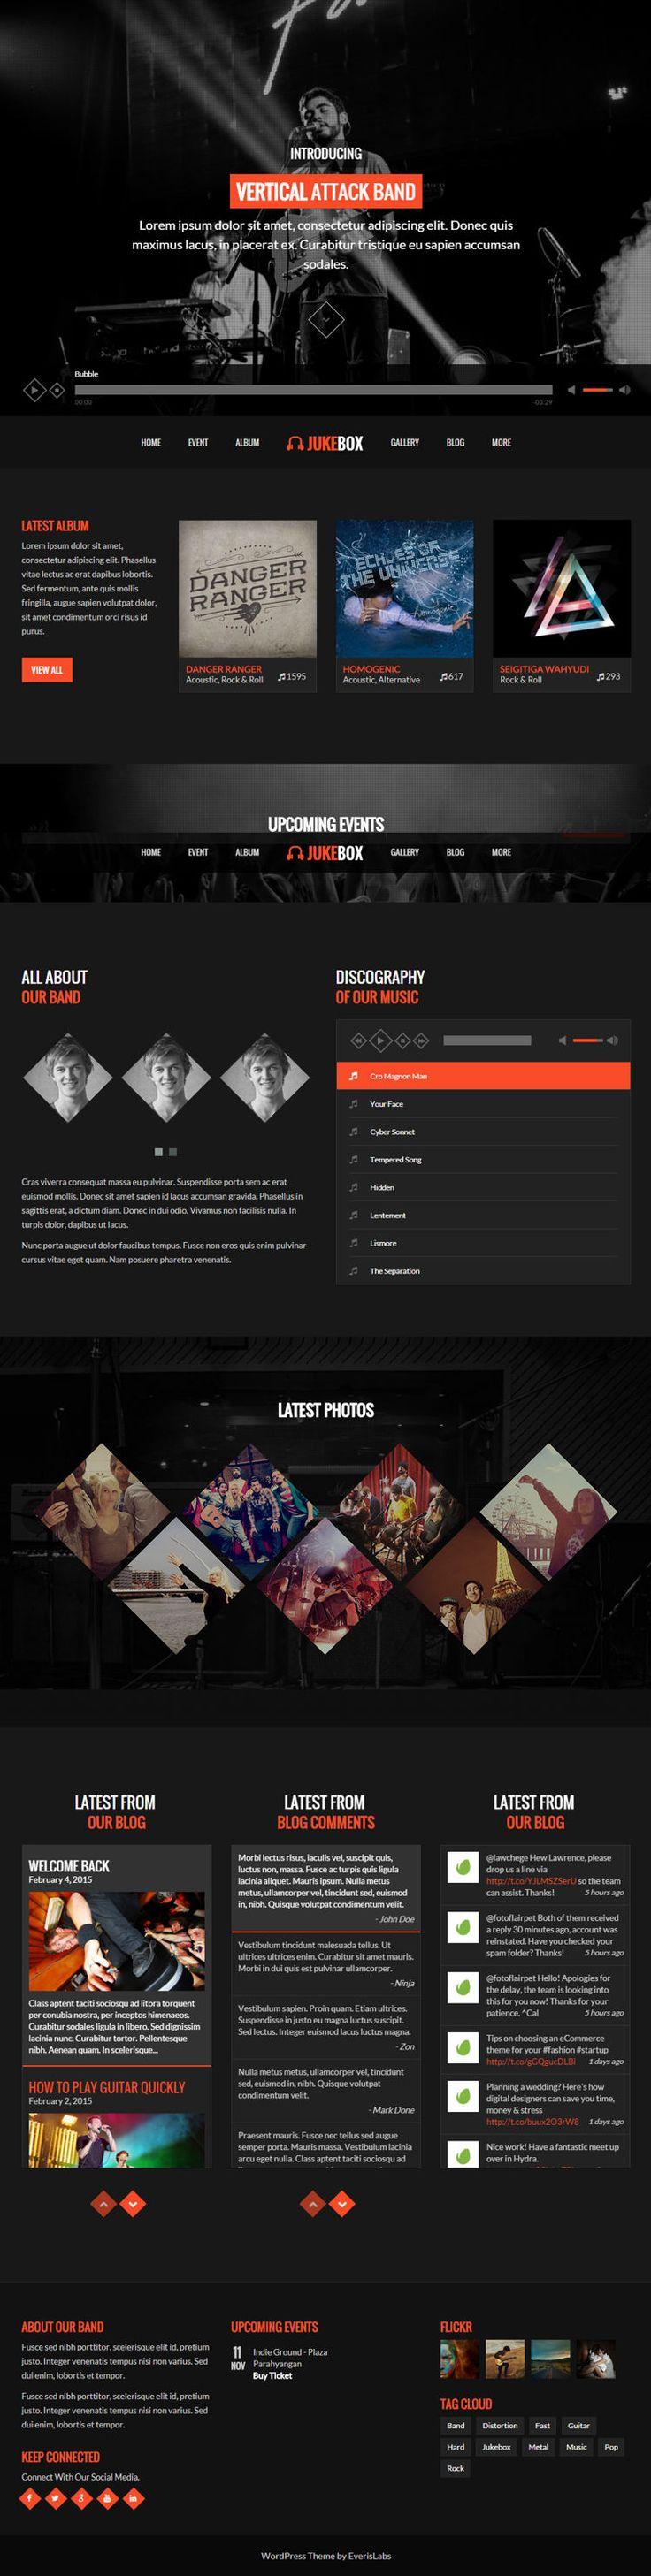 631 best Best WordPress Themes images on Pinterest